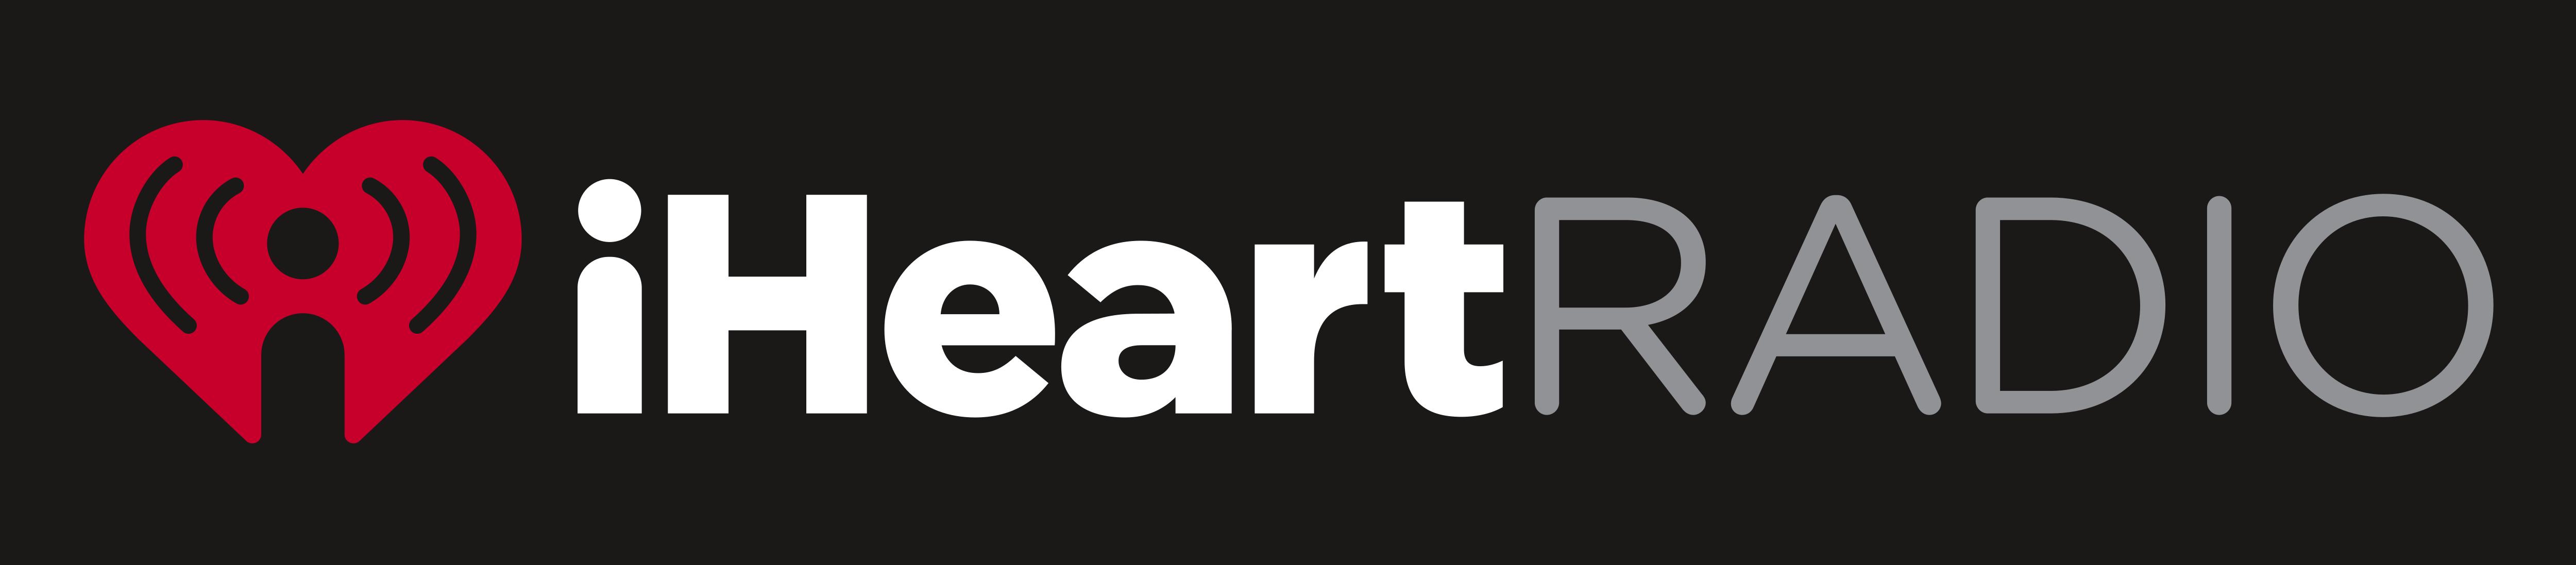 iHeartRadio link